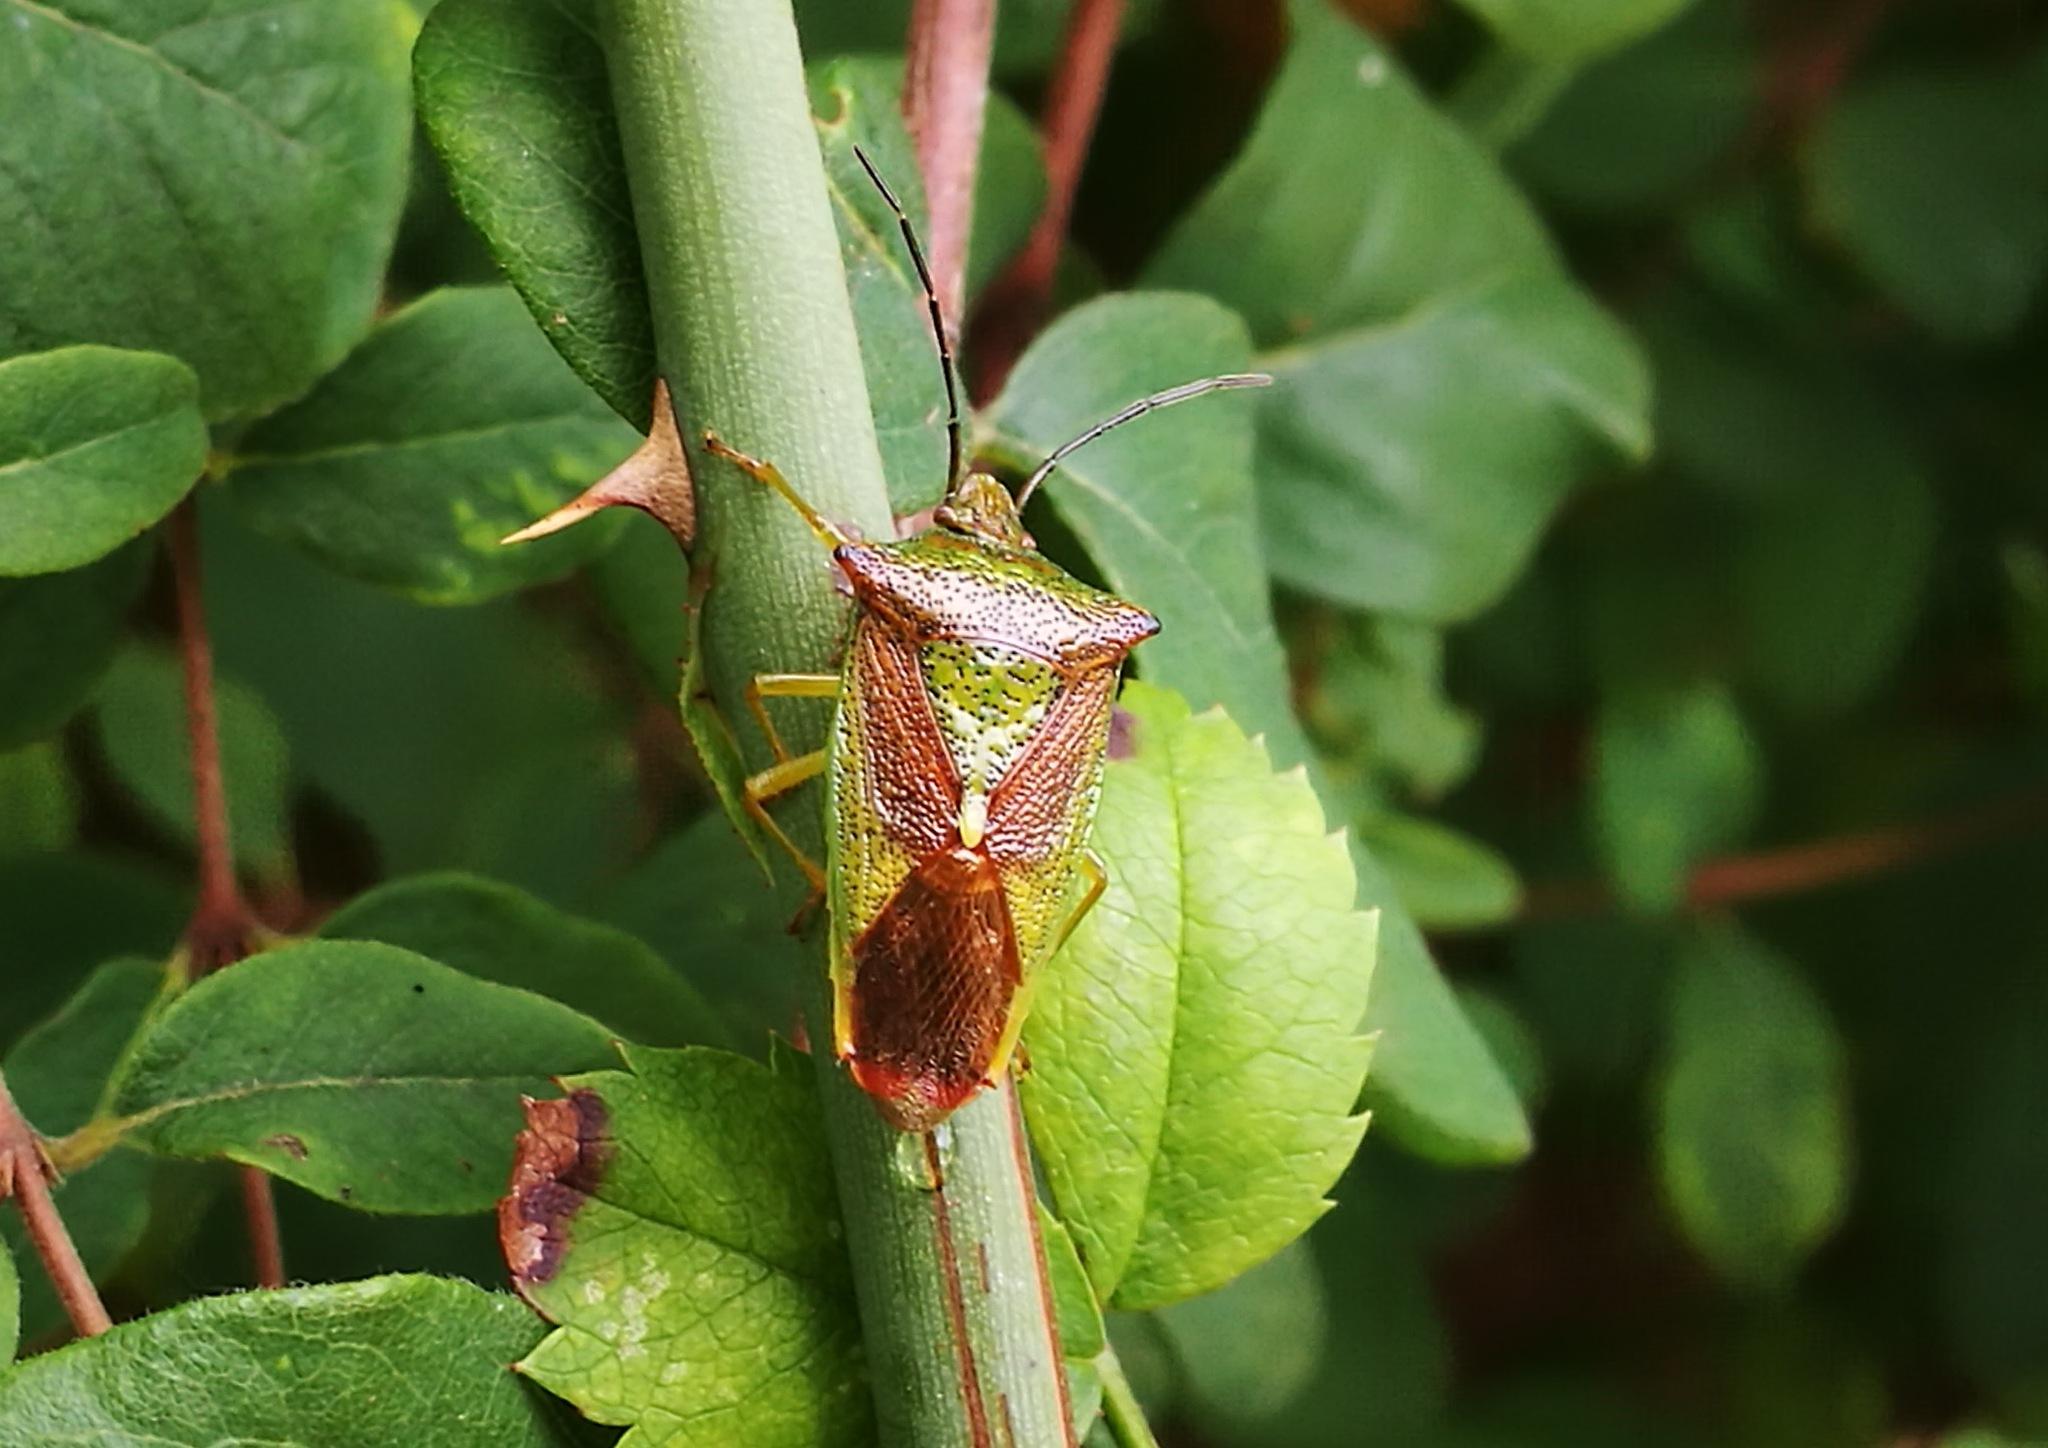 Bug by Steven Iodice